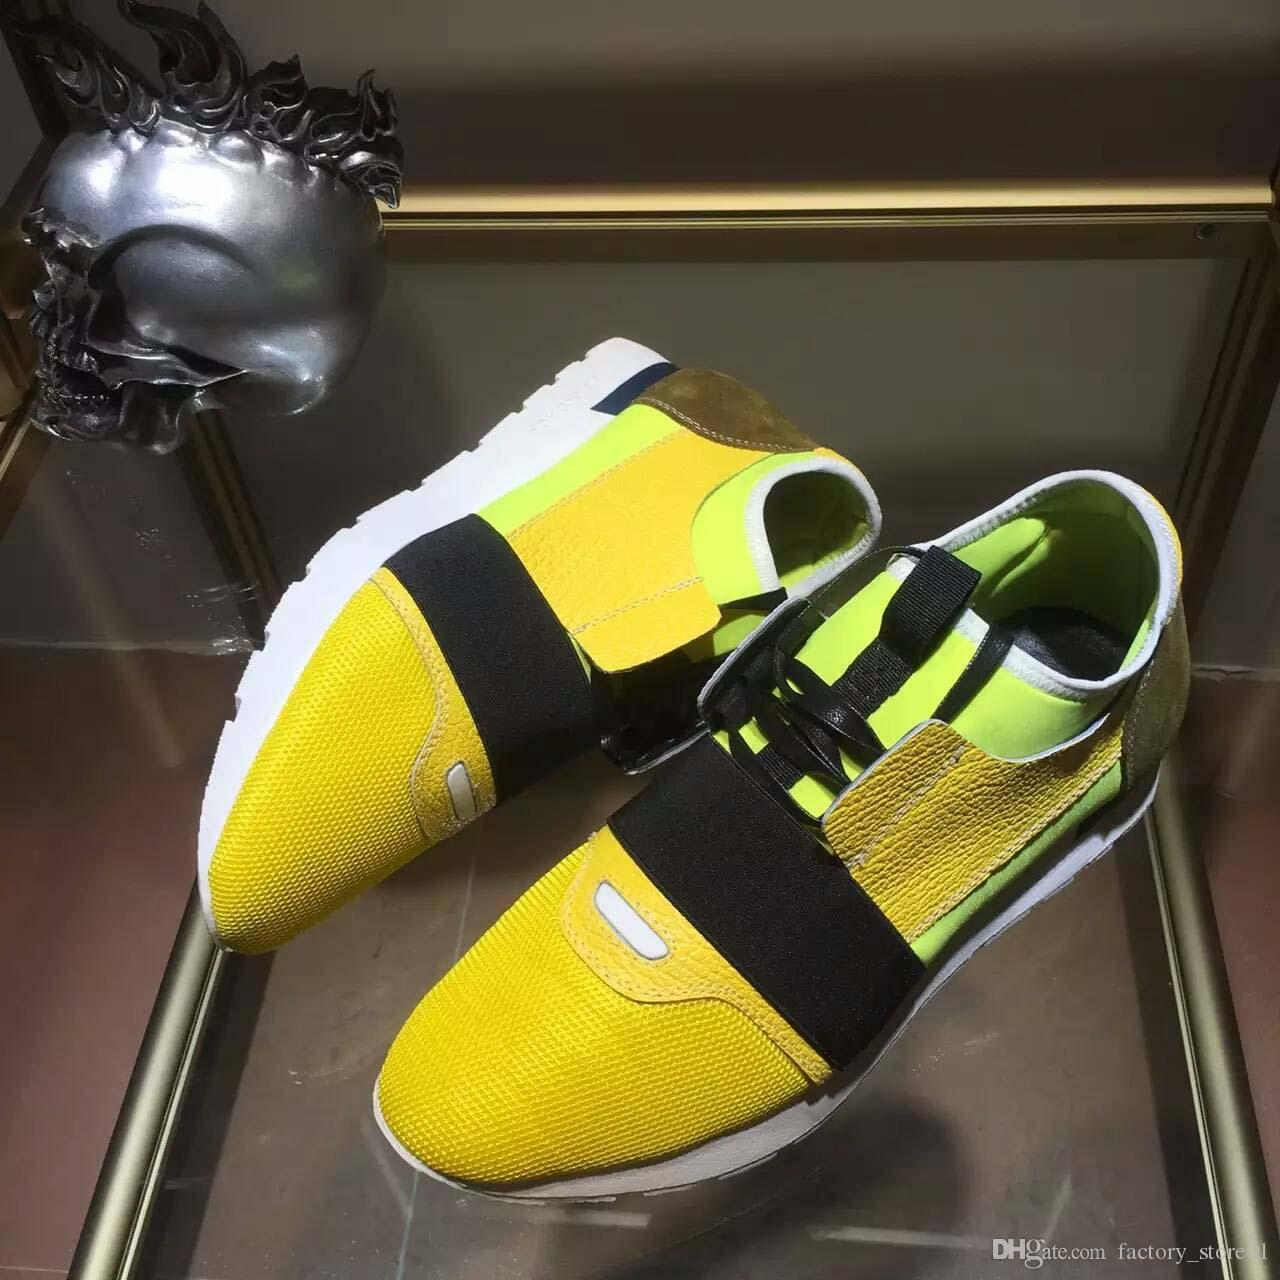 2018-zapatillas-deportivas-de-dise-o-running.jpg 7dcee741b62